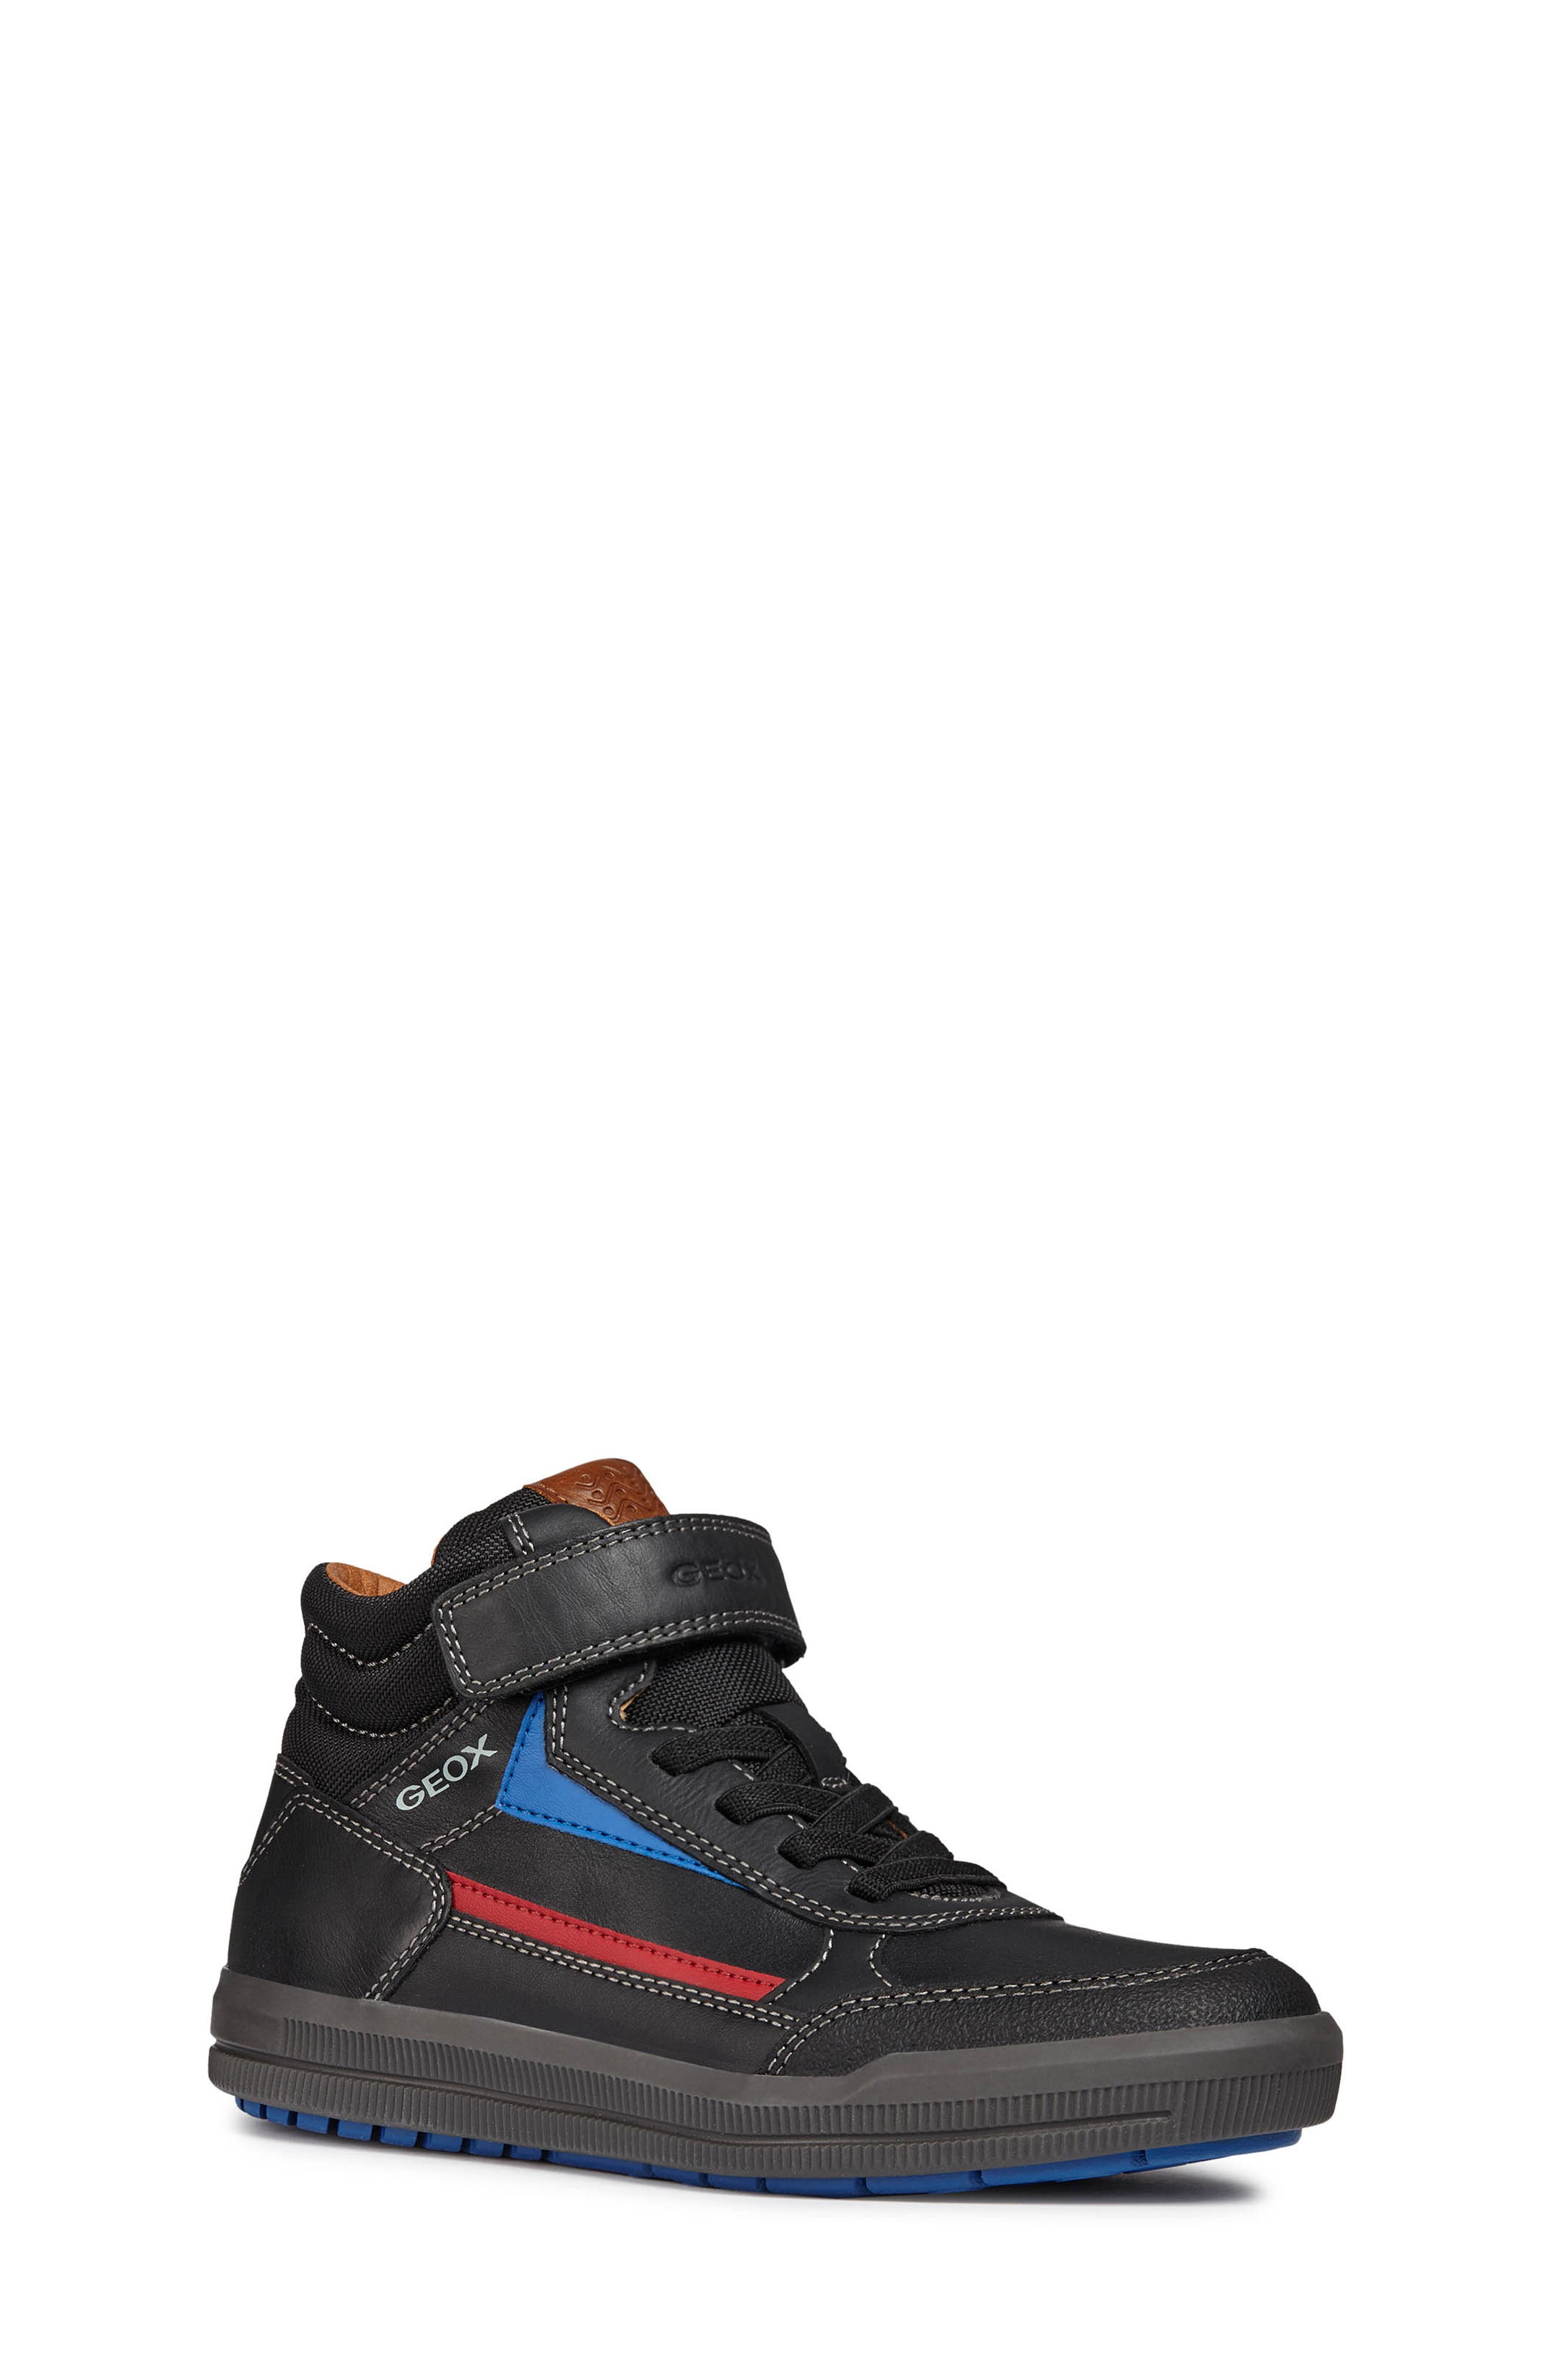 Arzach Mid Top Sneaker,                         Main,                         color, BLACK/RED